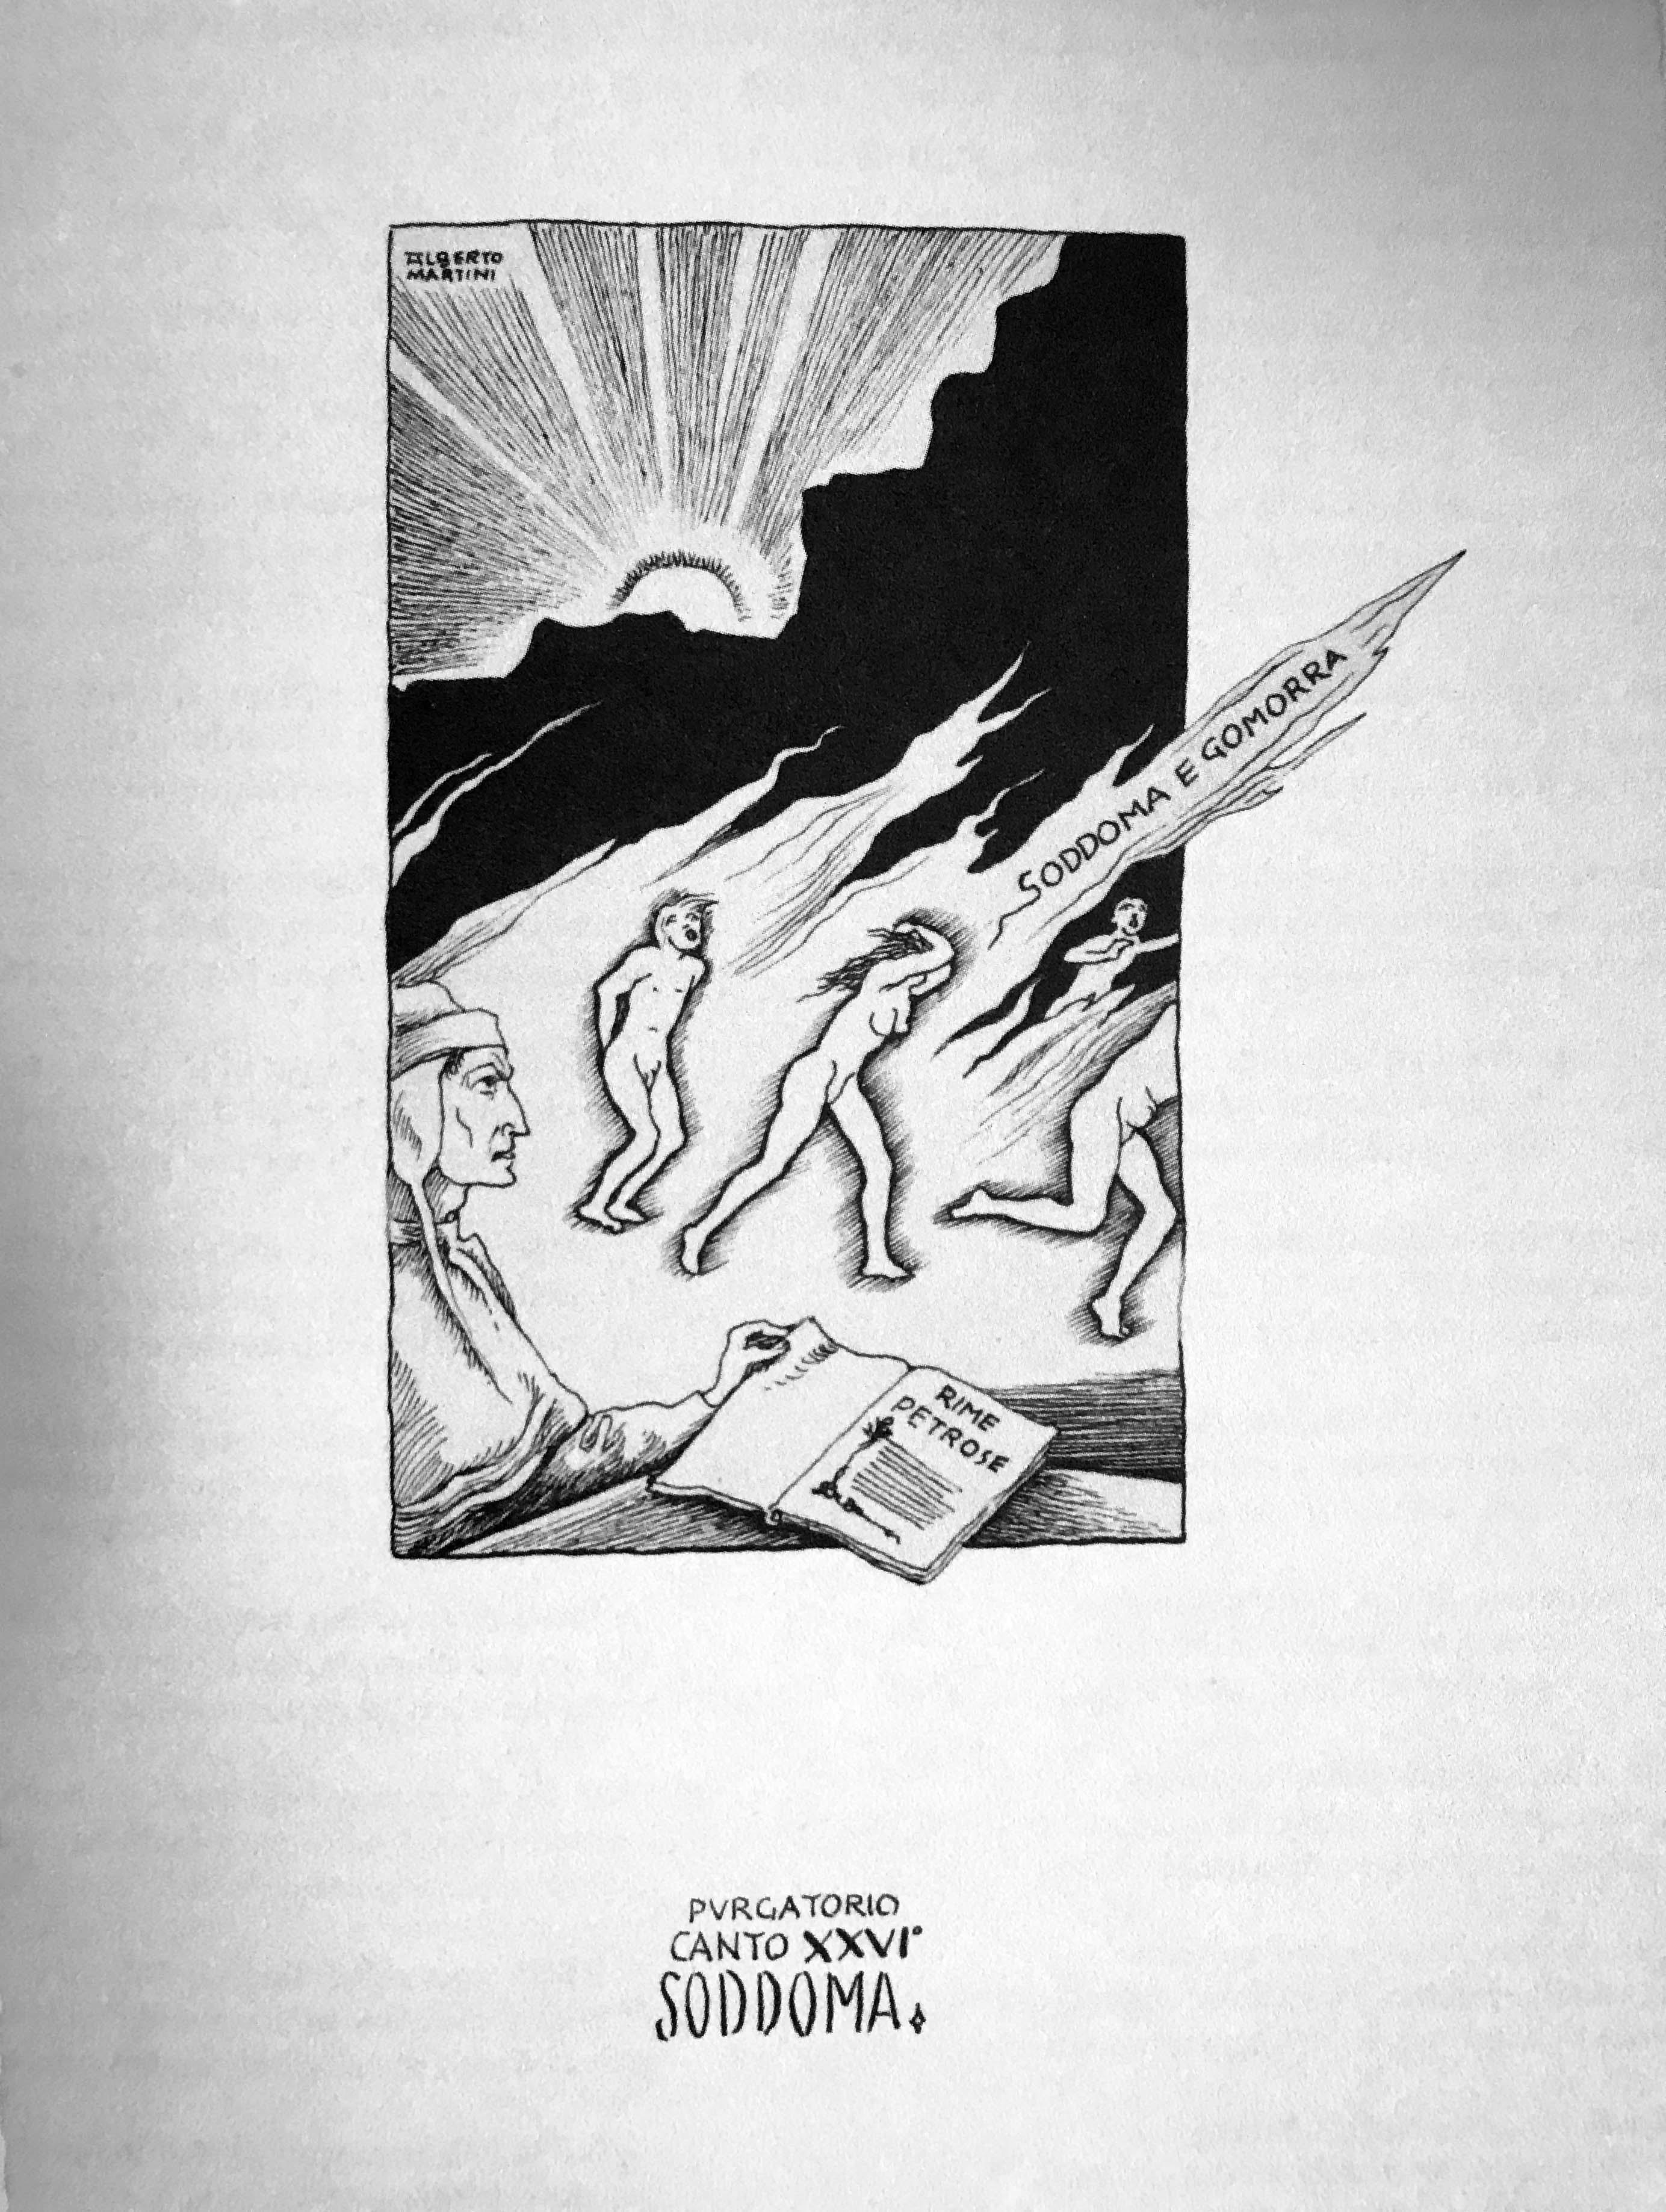 canto XXVI purgatorio